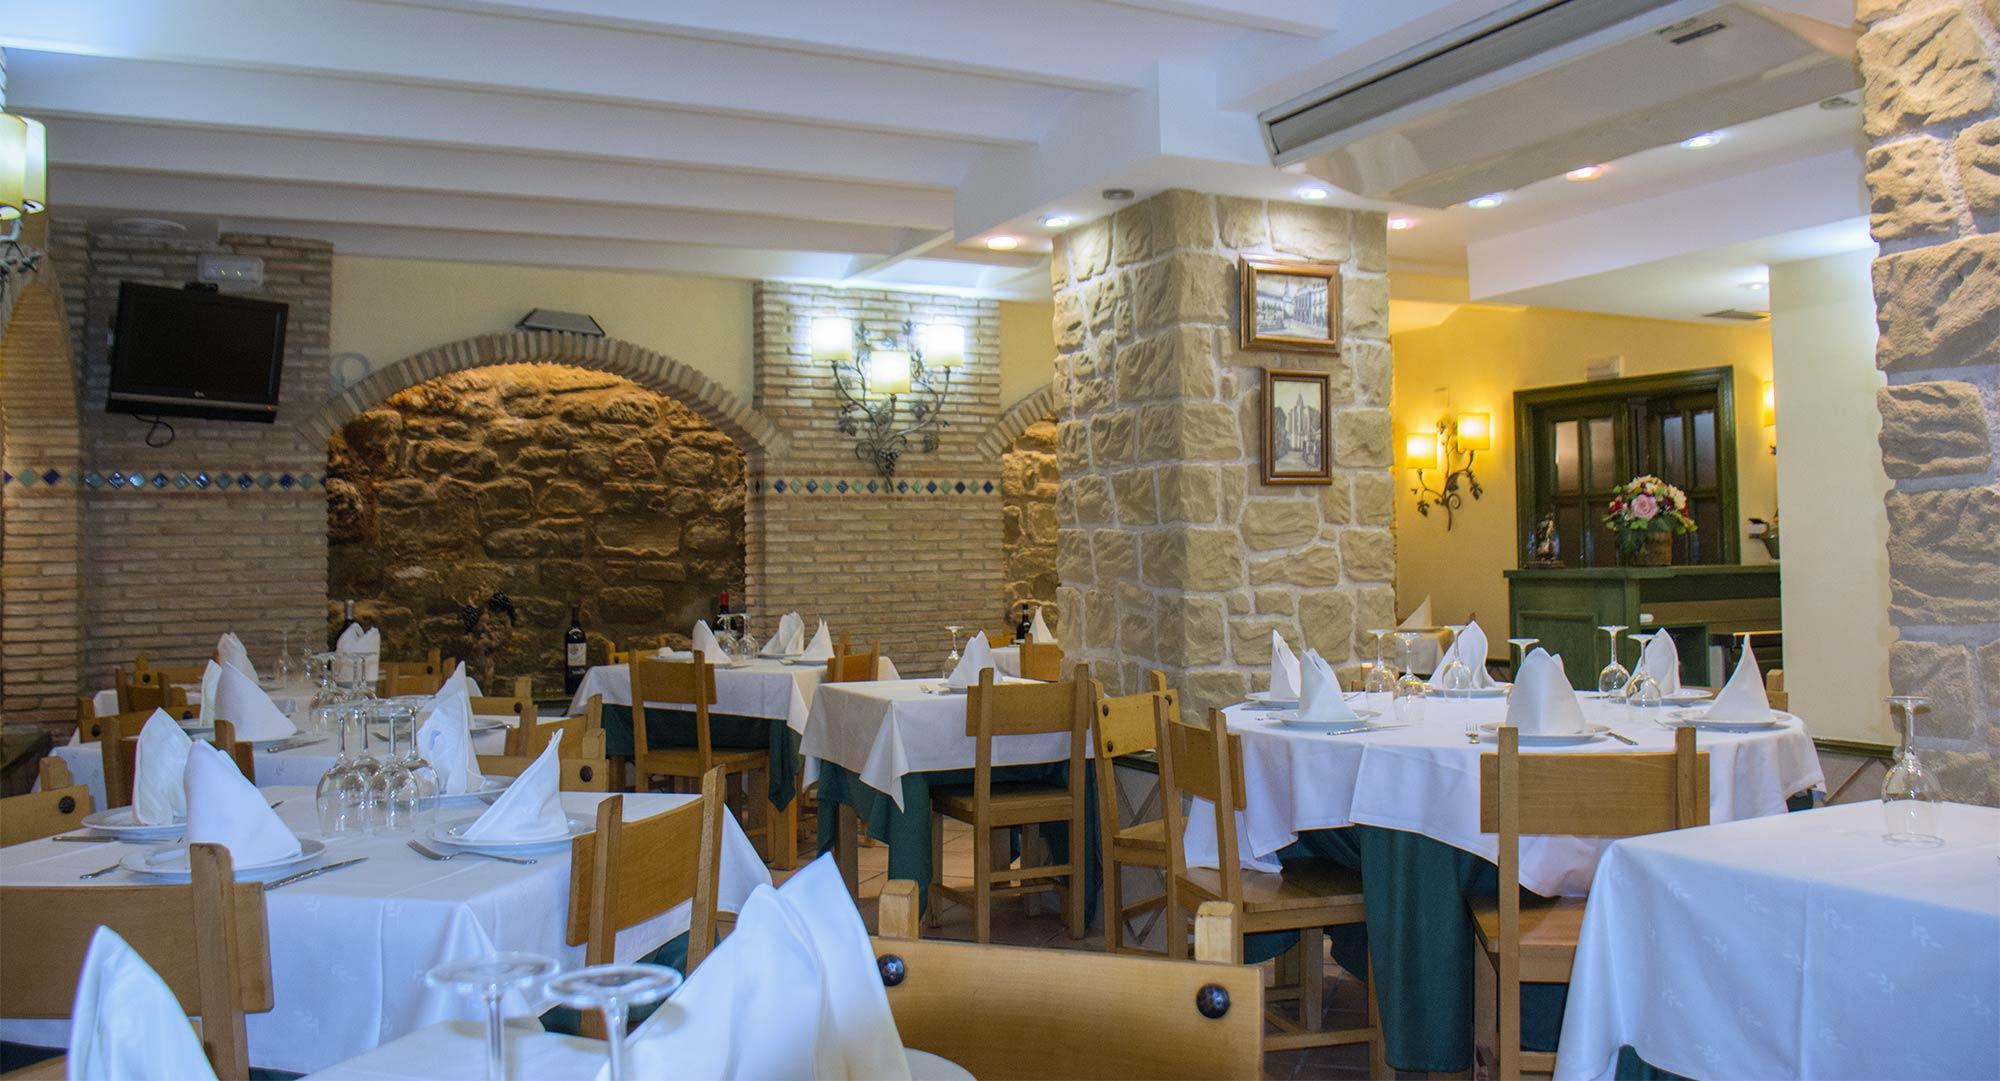 Nuevos comedores reformados - Restaurante Vega